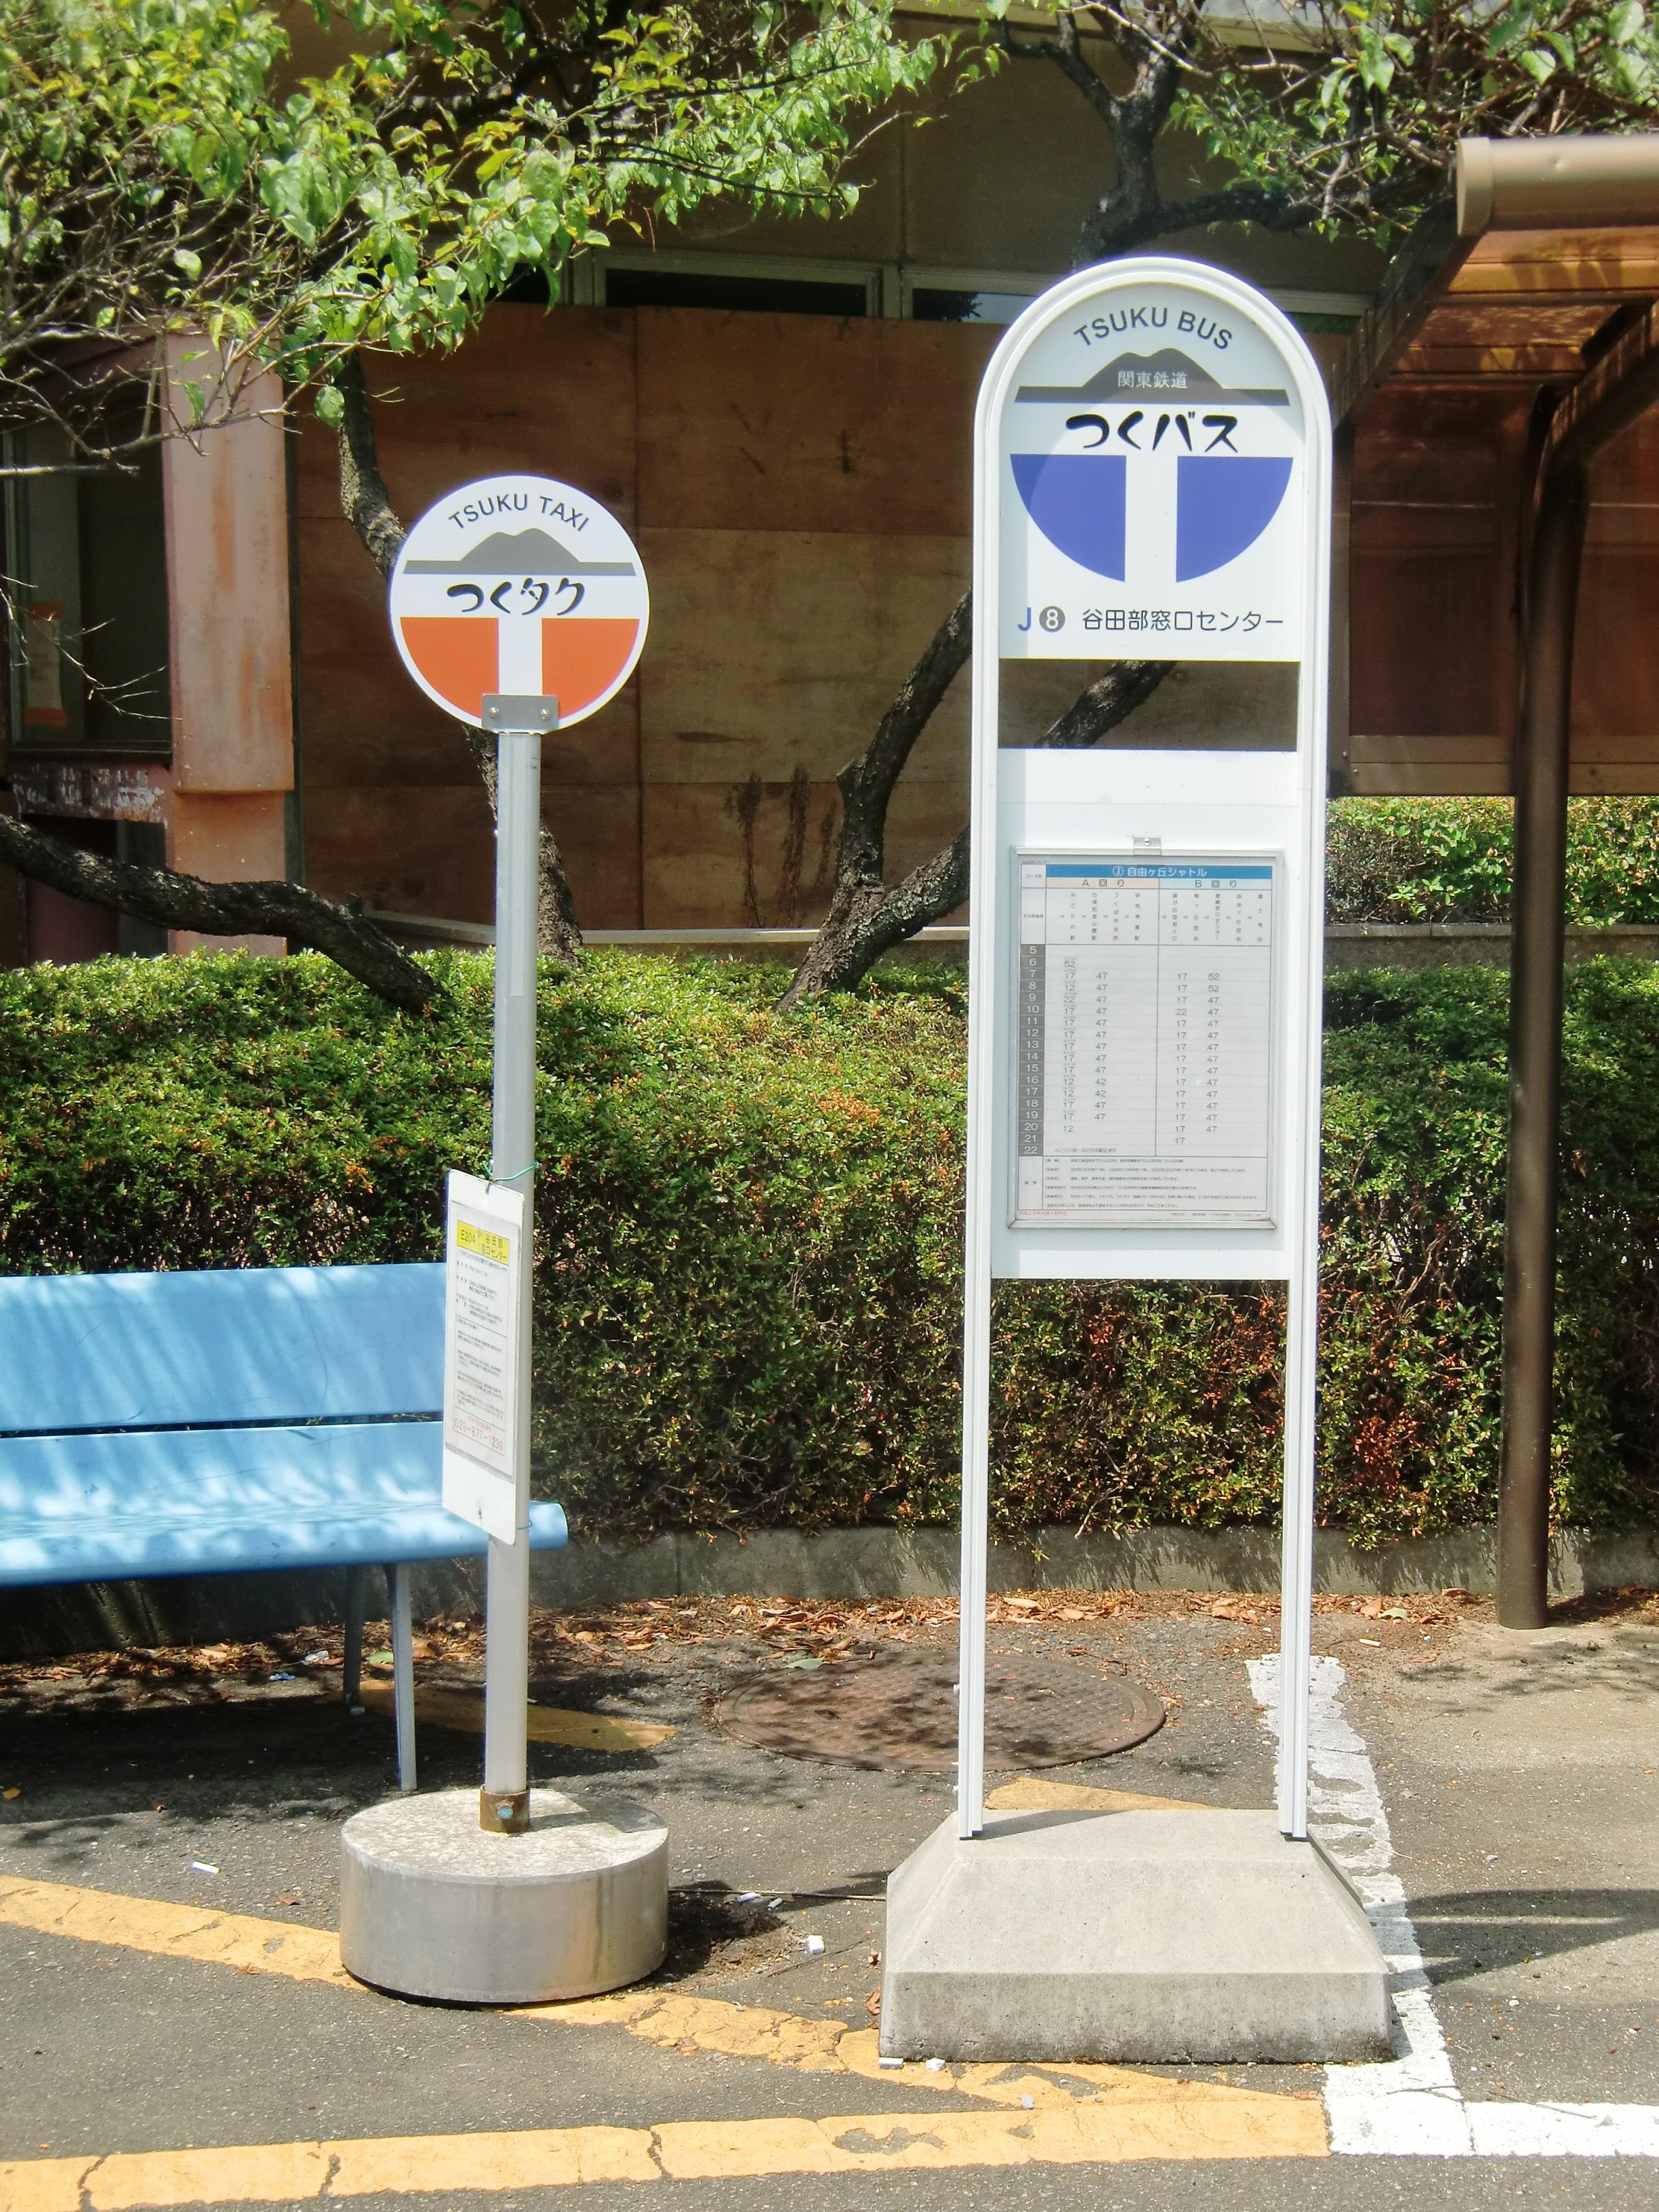 Filetsuku Bustsuku Taxi Stop Sign01Jpg - Wikimedia Commons-8631